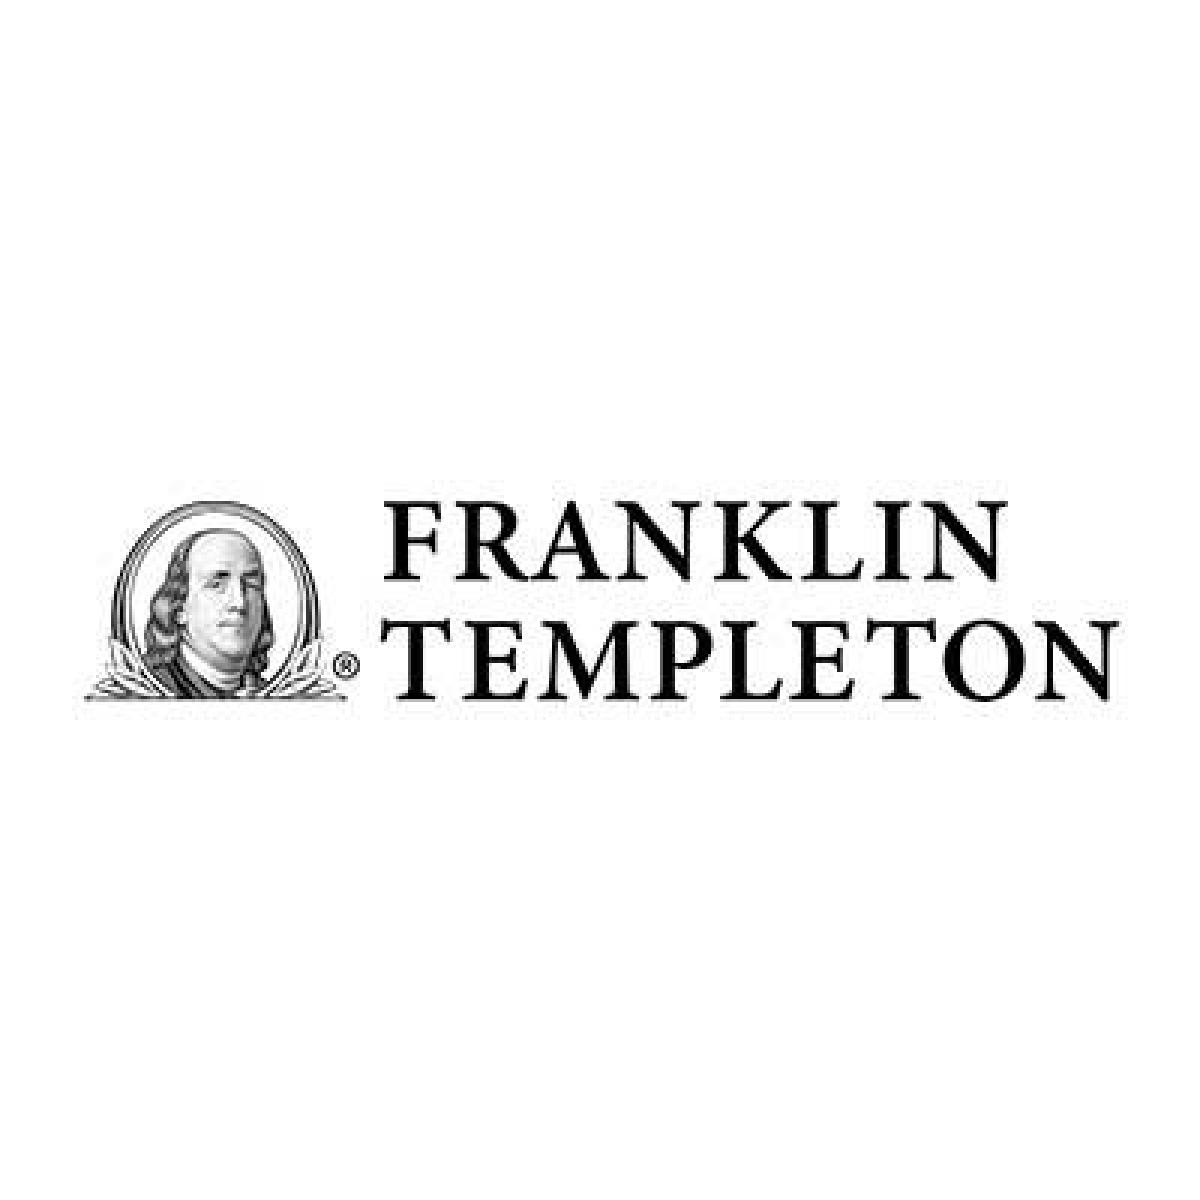 Making effort to ensure orderly, equitable exit to investors: Franklin Templeton MF